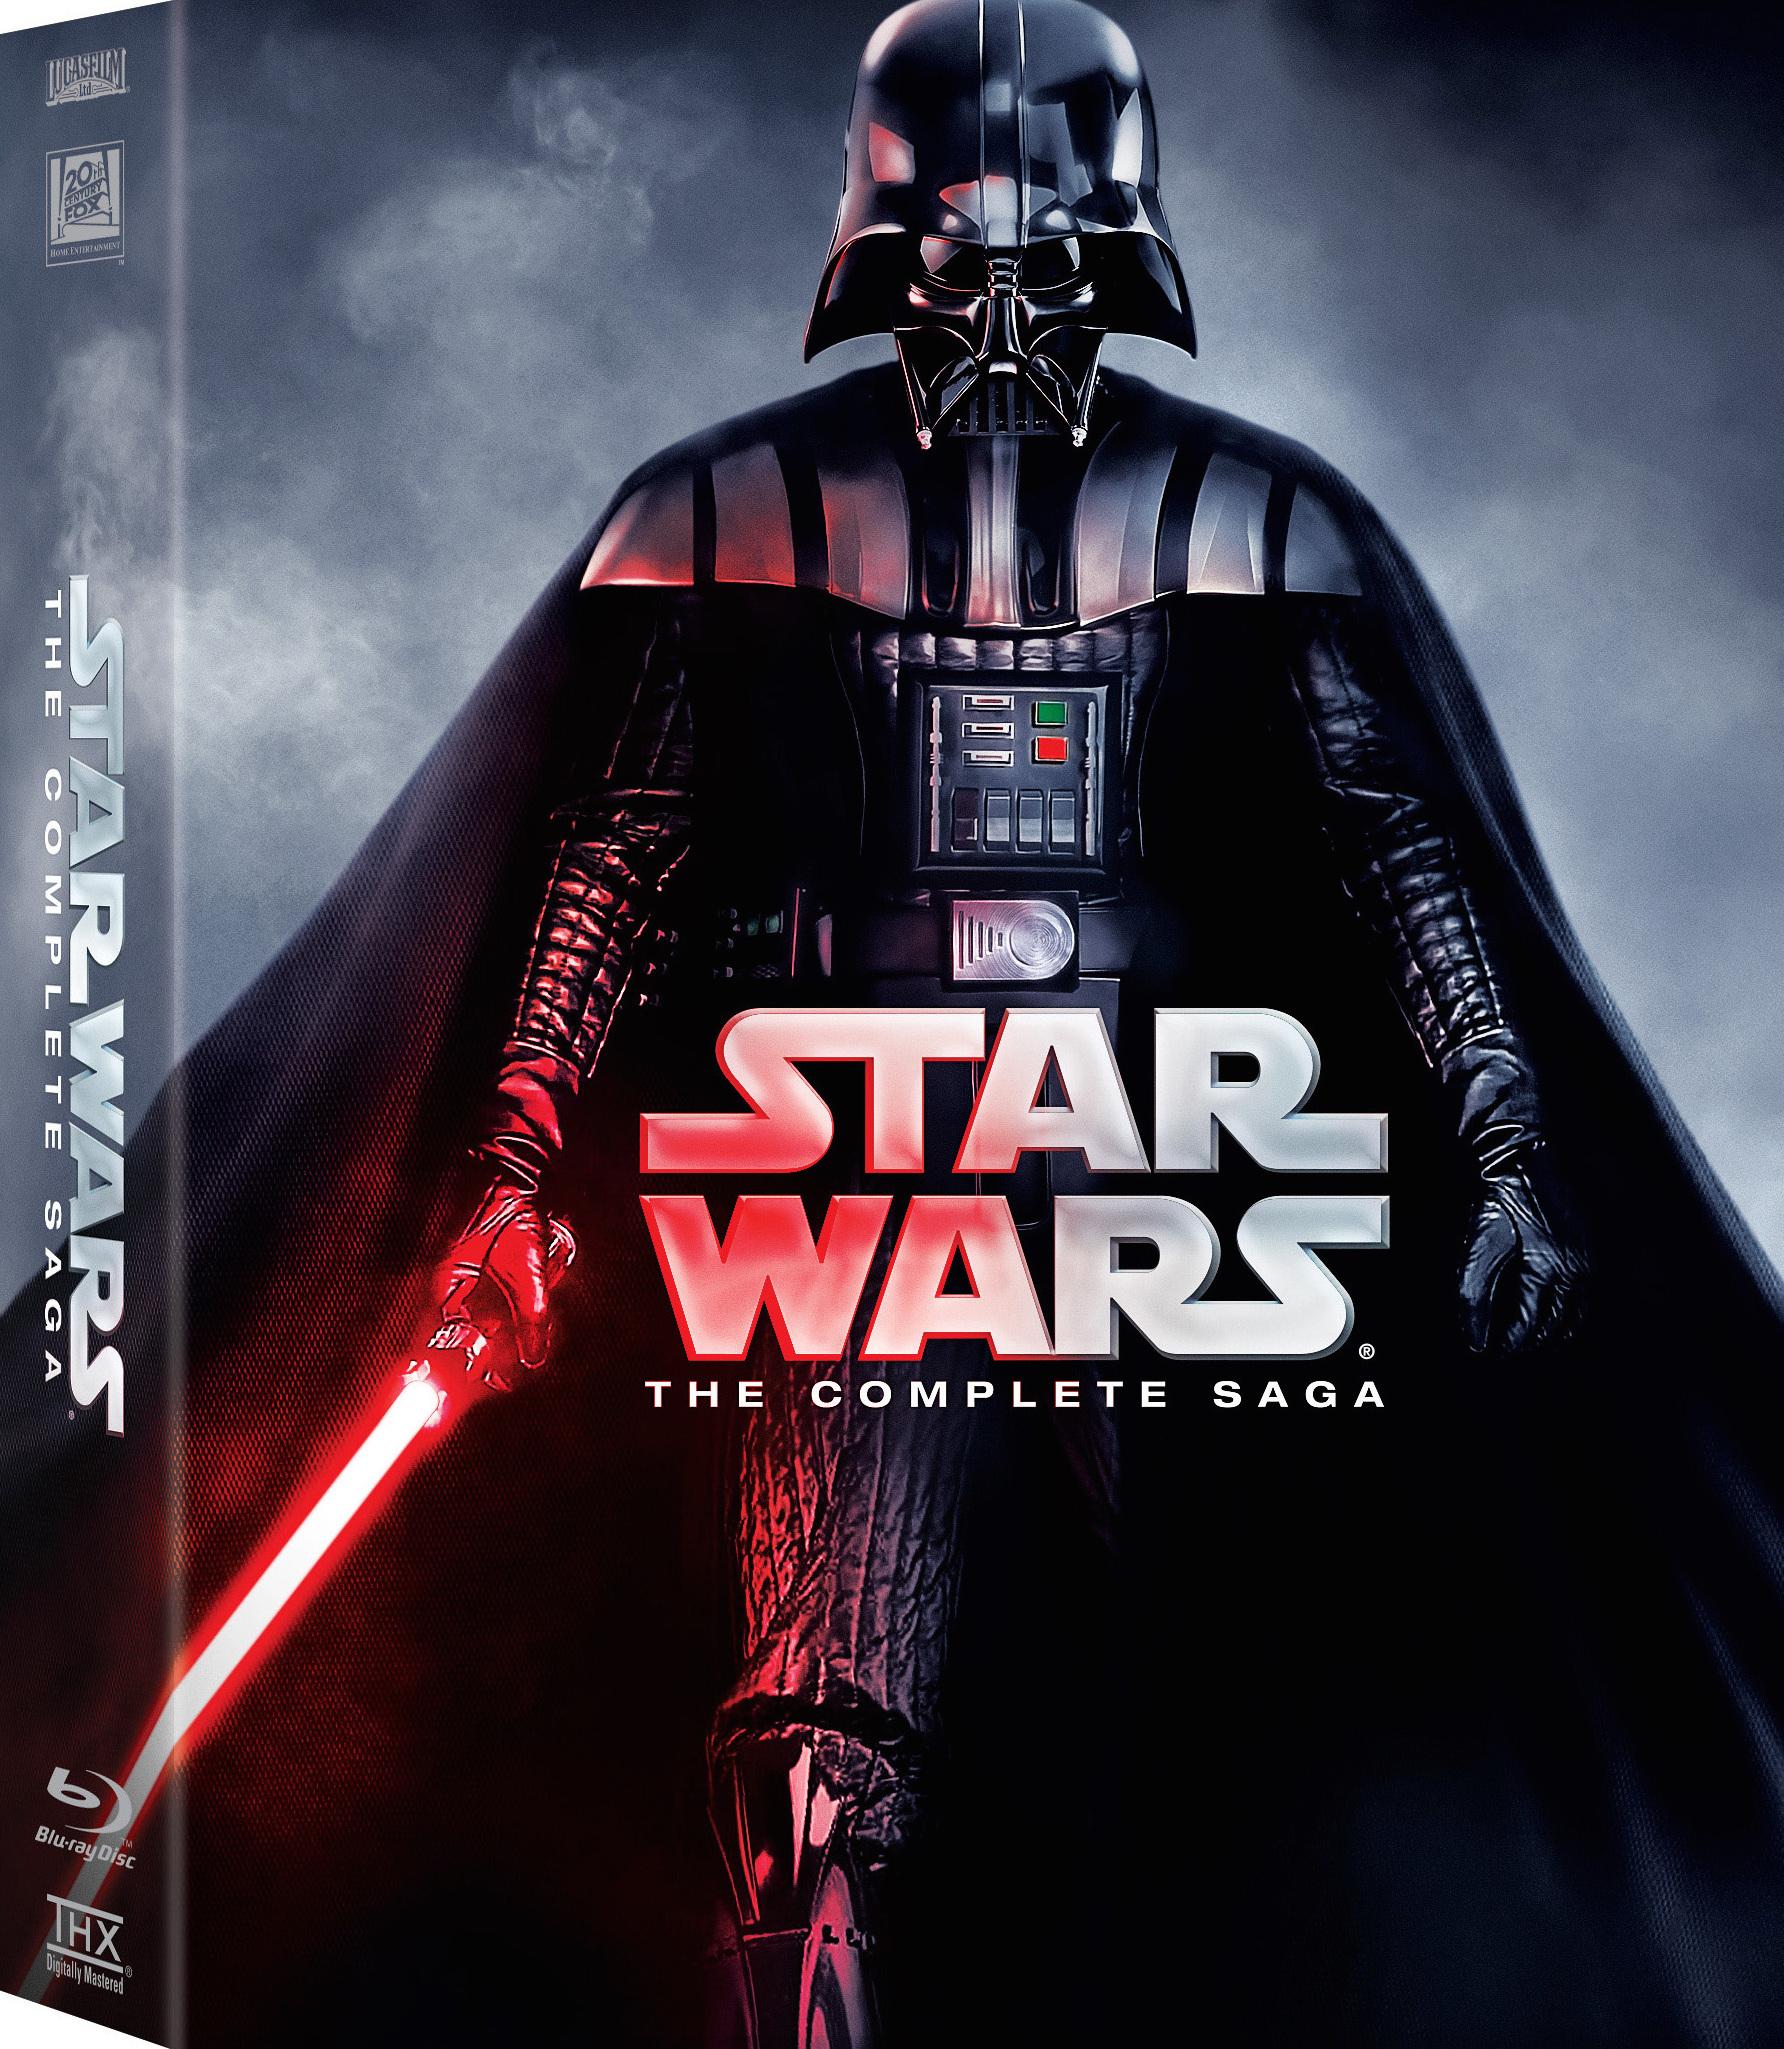 File:Star Wars The Complete Saga Blu-ray re-release.jpg